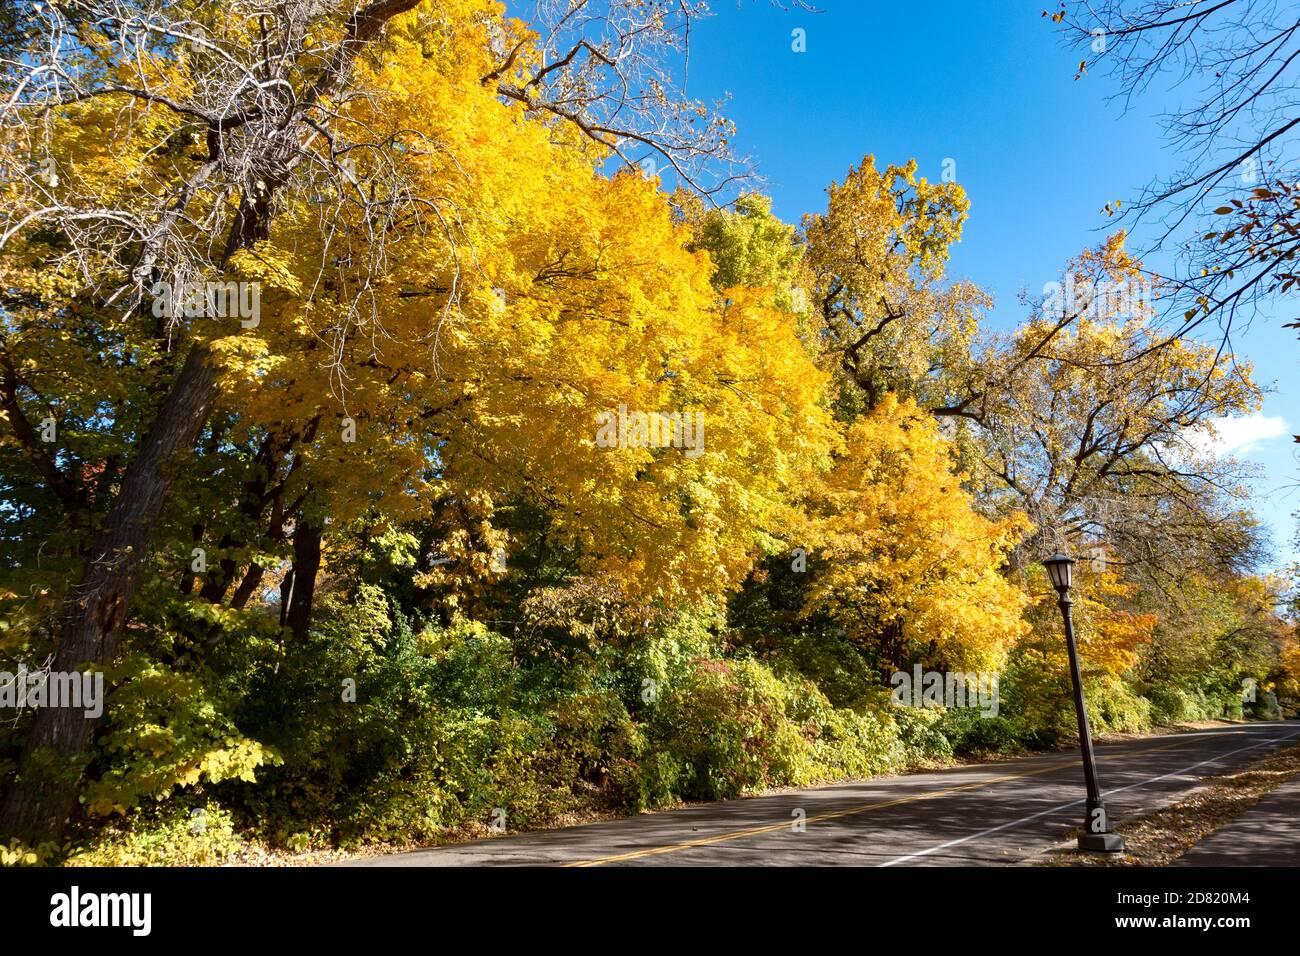 Die Farbe der Herbstbäume ändert sich entlang des North Mississippi River Boulevard Trails. St. Paul Minnesota, USA Stockfoto